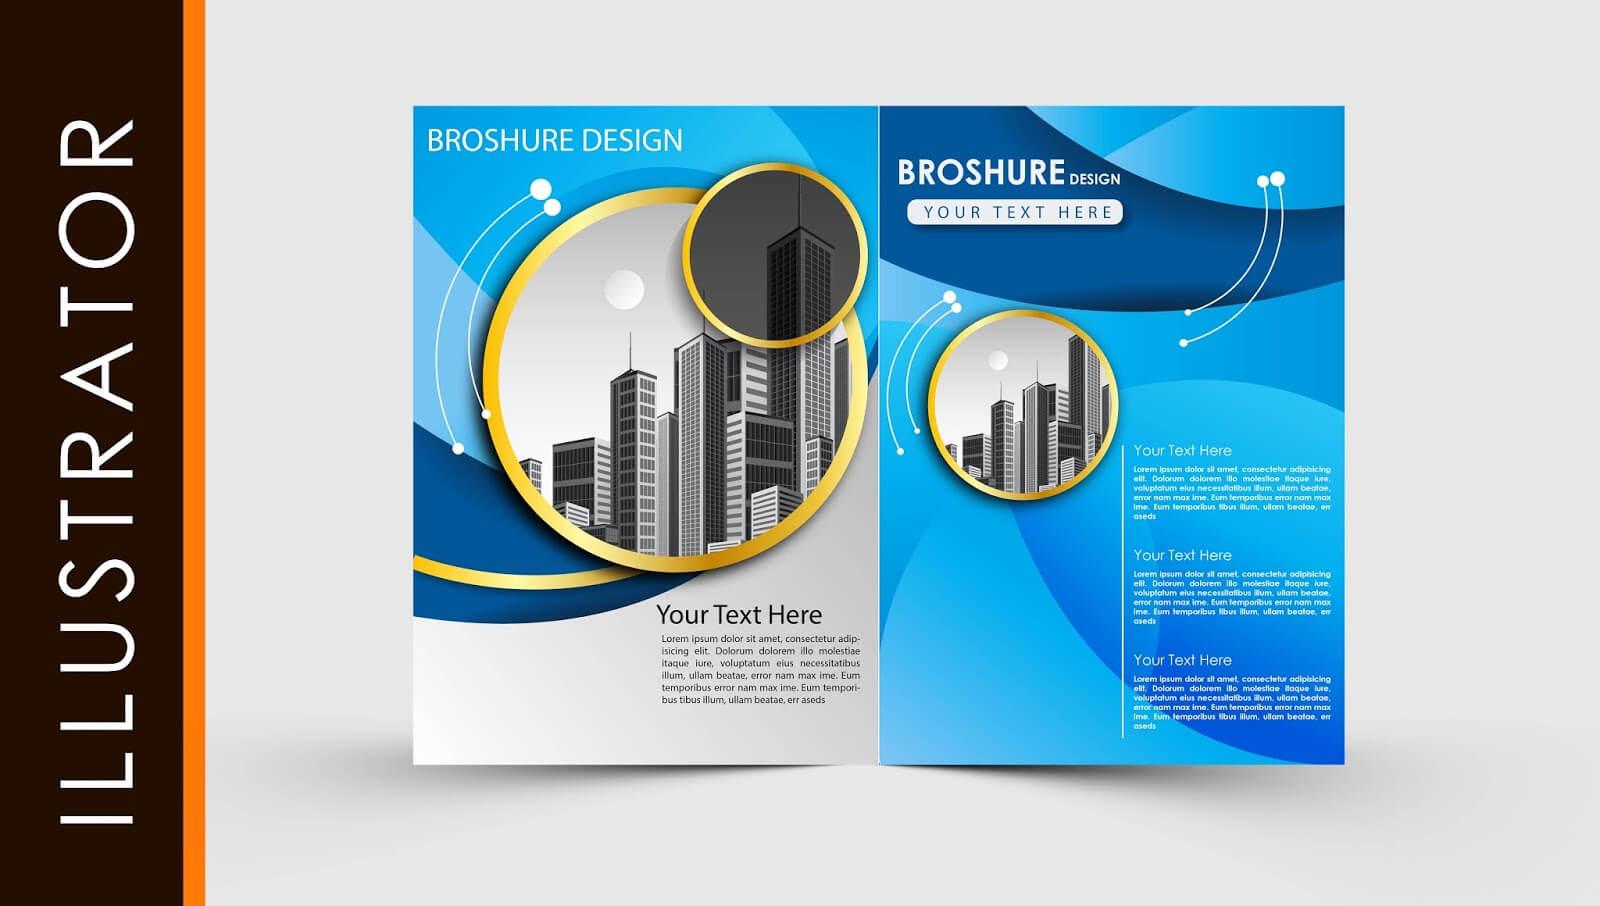 Free Download Adobe Illustrator Template Brochure Two Fold Inside Adobe Illustrator Brochure Templates Free Download